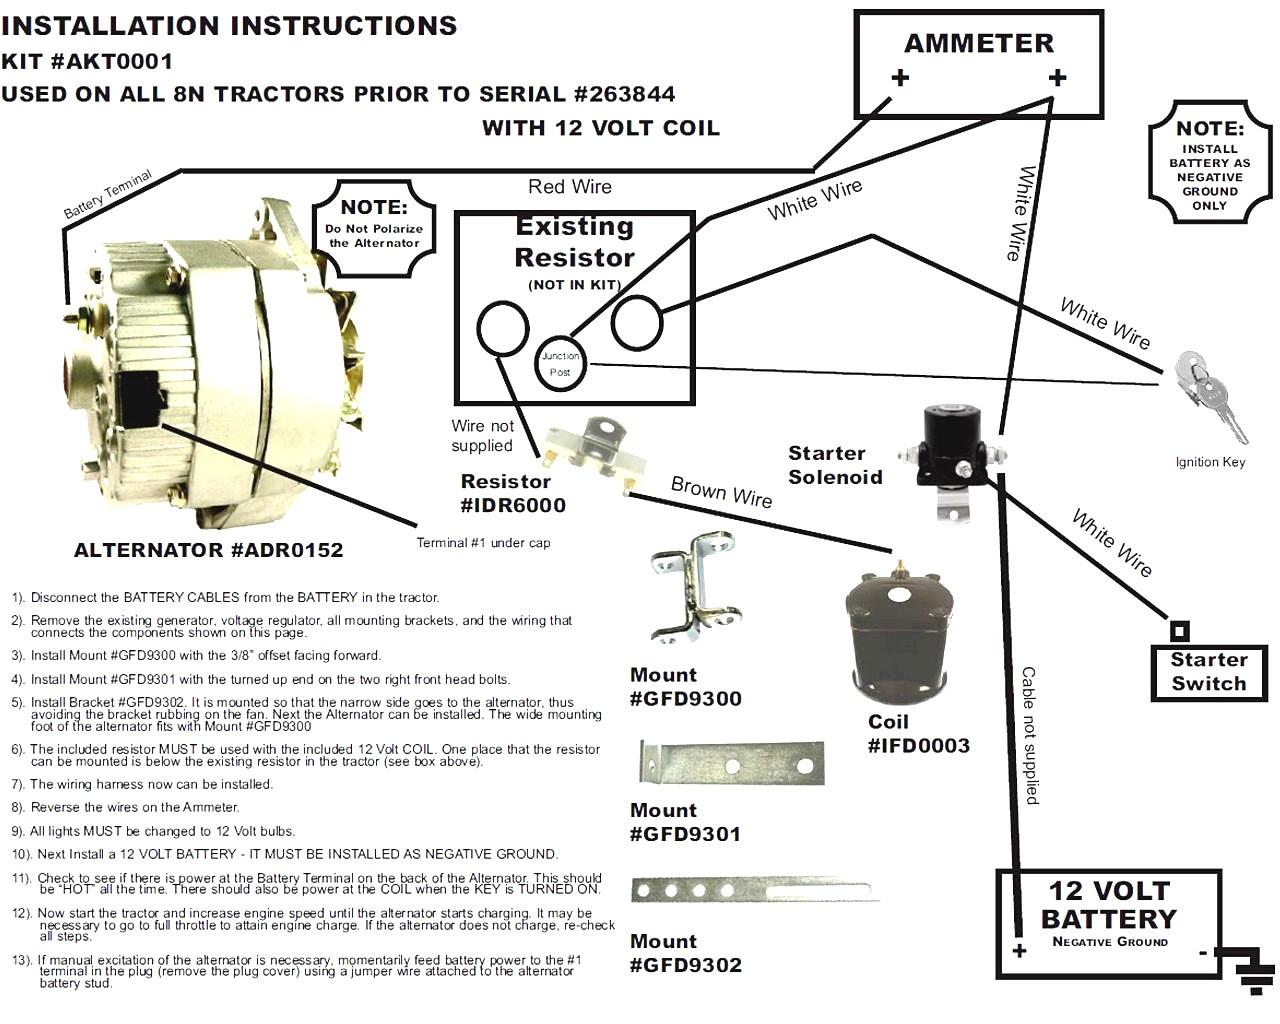 [DIAGRAM_1JK]  TB_4808] Alternator Wiring Diagram Also Denso Alternator Wiring Diagram  Schematic Wiring | Denso Alternator Wiring Jeep |  | Sequ Xeira Xeira Mohammedshrine Librar Wiring 101